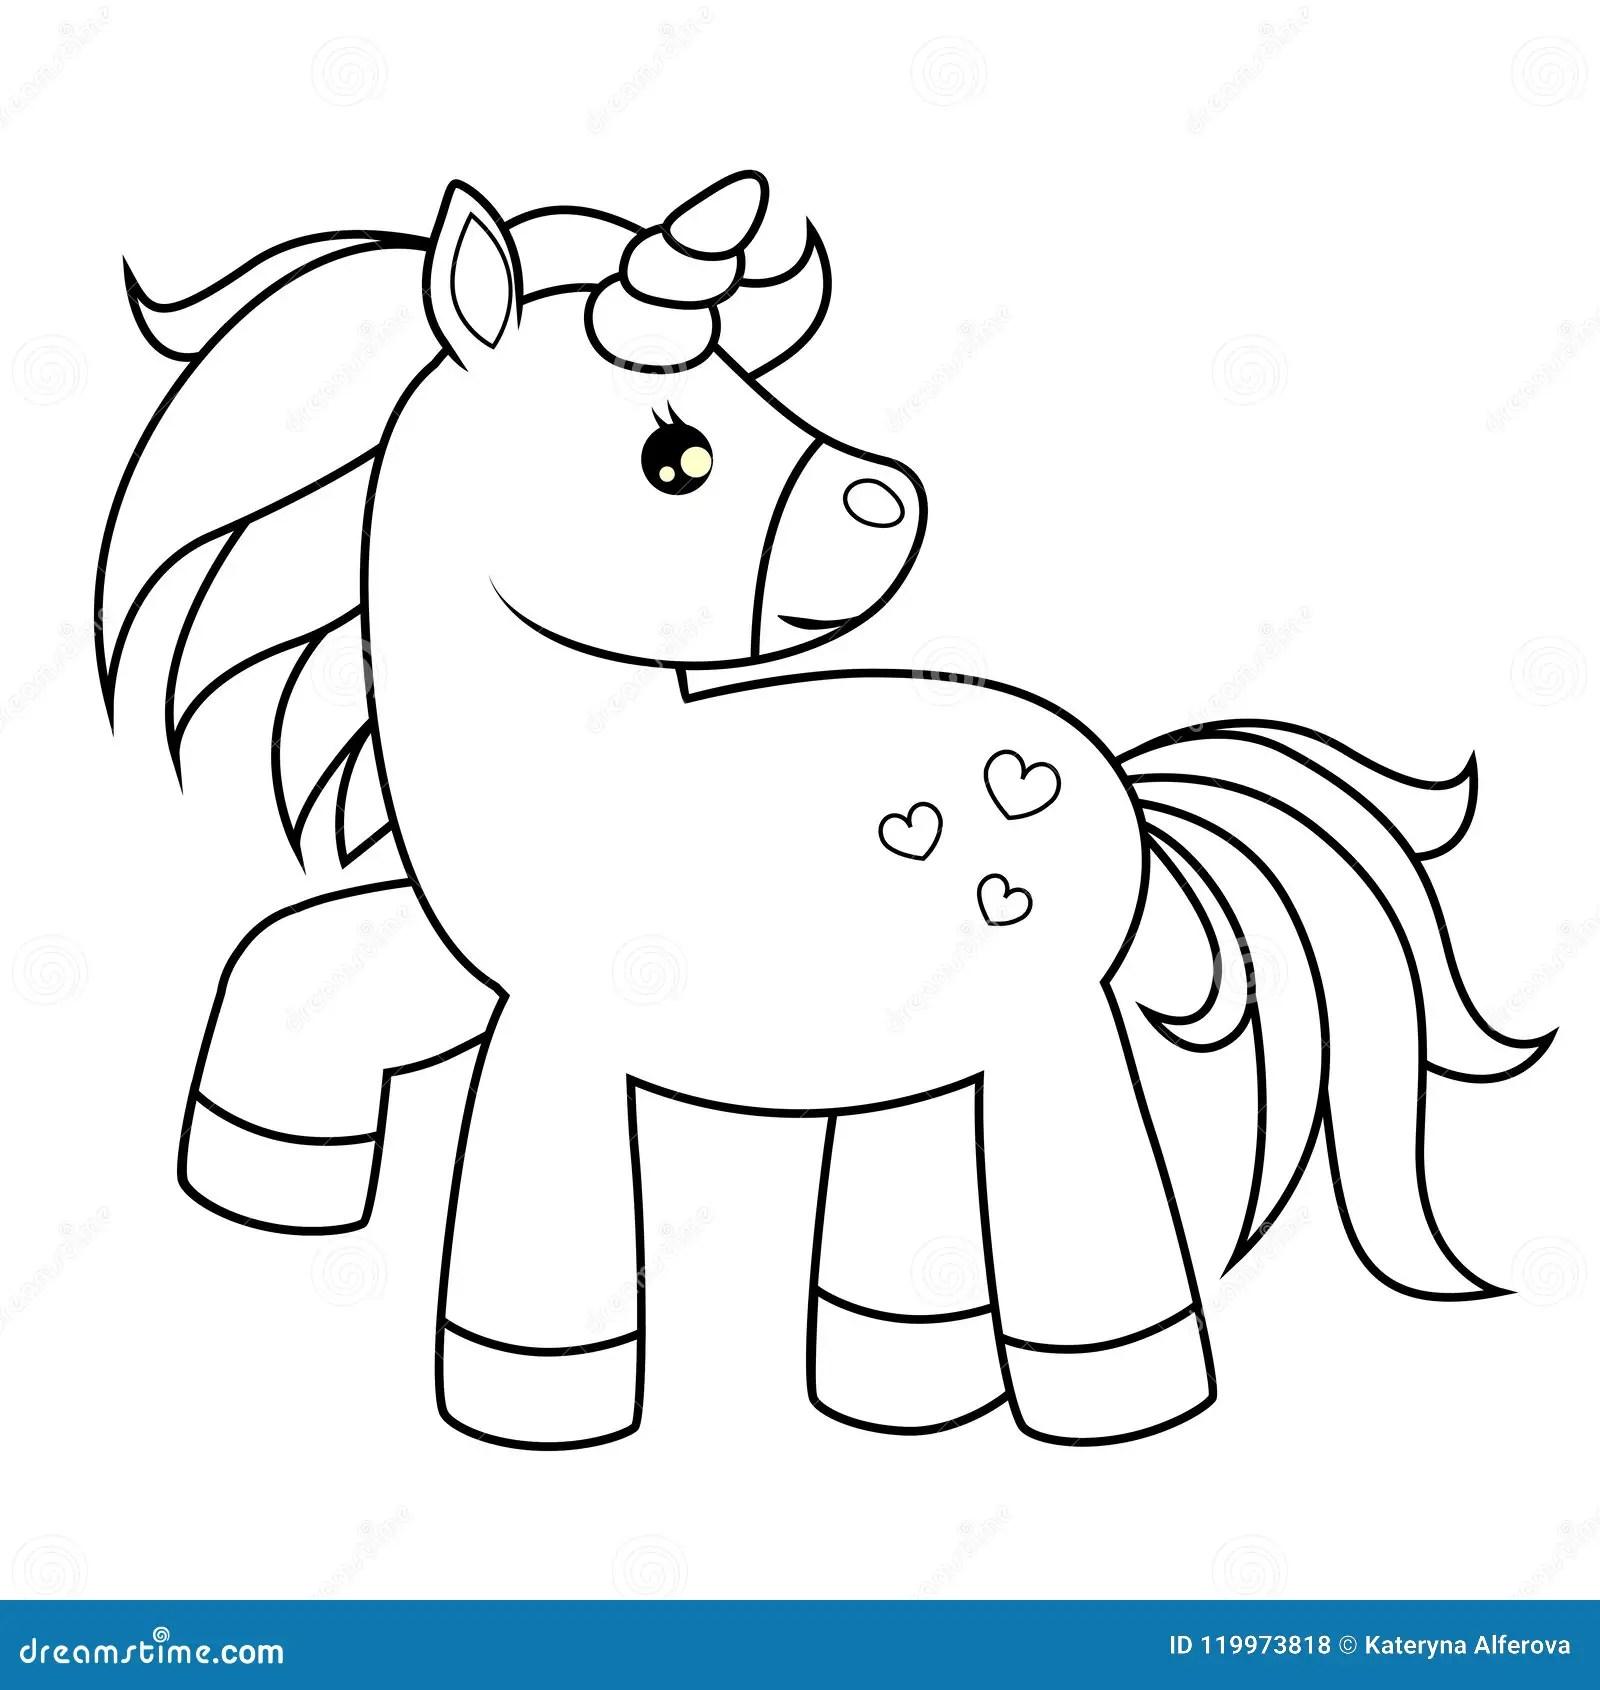 Cute Cartoon Unicorn Black And White Vector Illustration